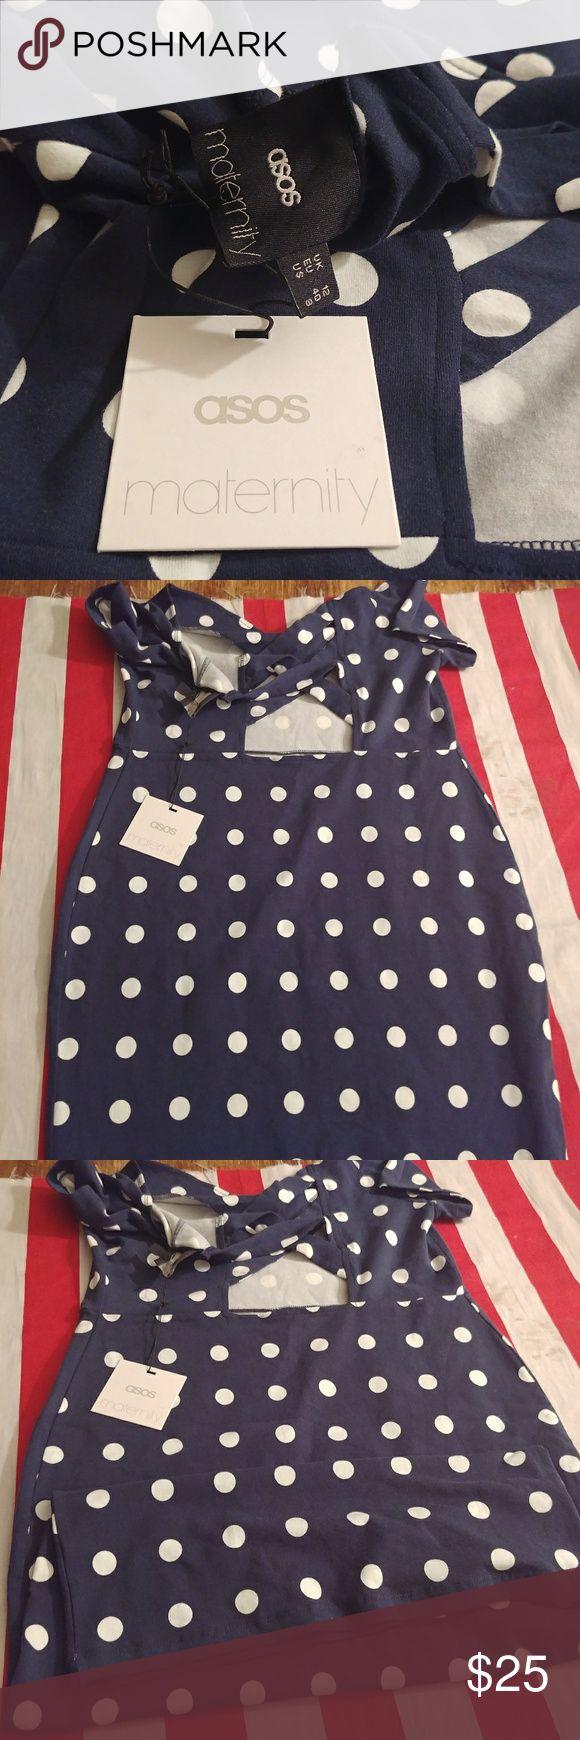 Asos maternity dress bodycon cut out back sz 8 Navy Blue polka dot maternity dress ASOS Maternity Dresses Midi